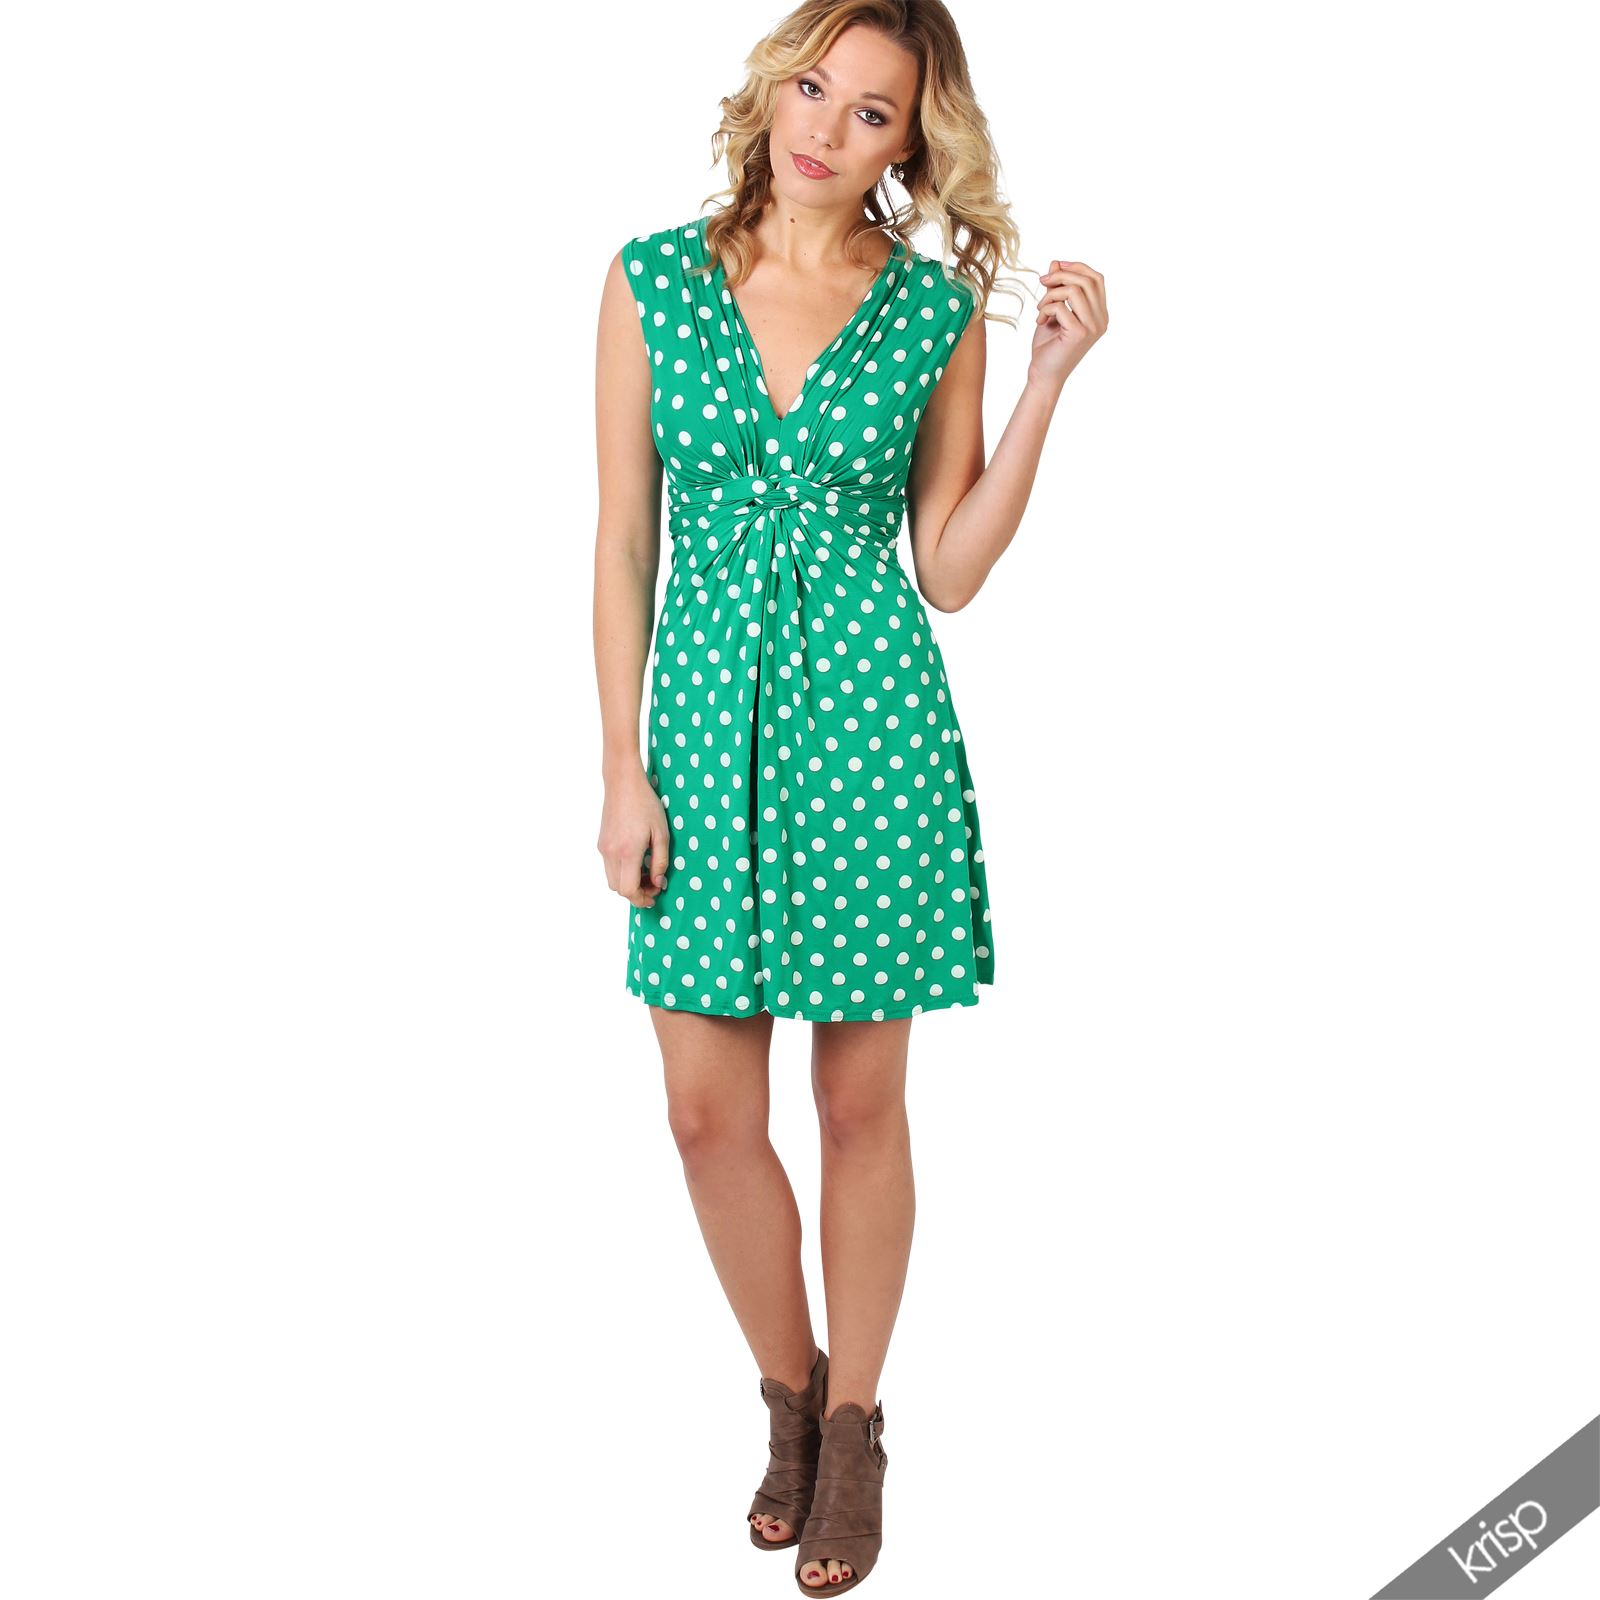 Womens-Polka-Dot-Retro-Dress-Pleated-Skirt-Wrap-Mini-V-Neck-Top-Swing-Party thumbnail 15